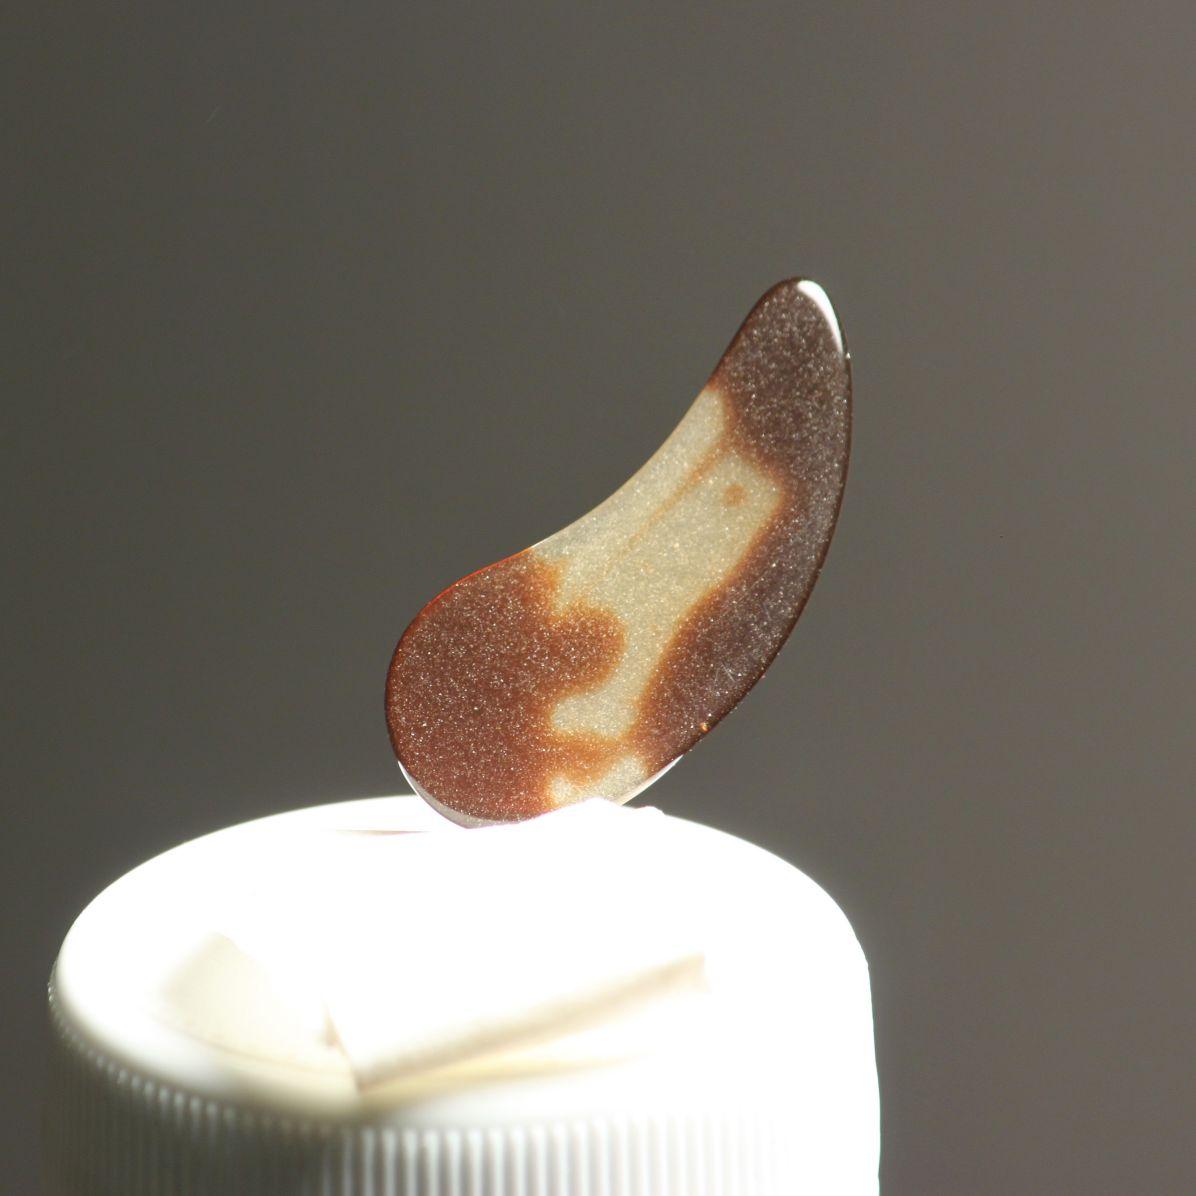 Manmade guzheng nail lit by 200W bulb to reveal microcracks.